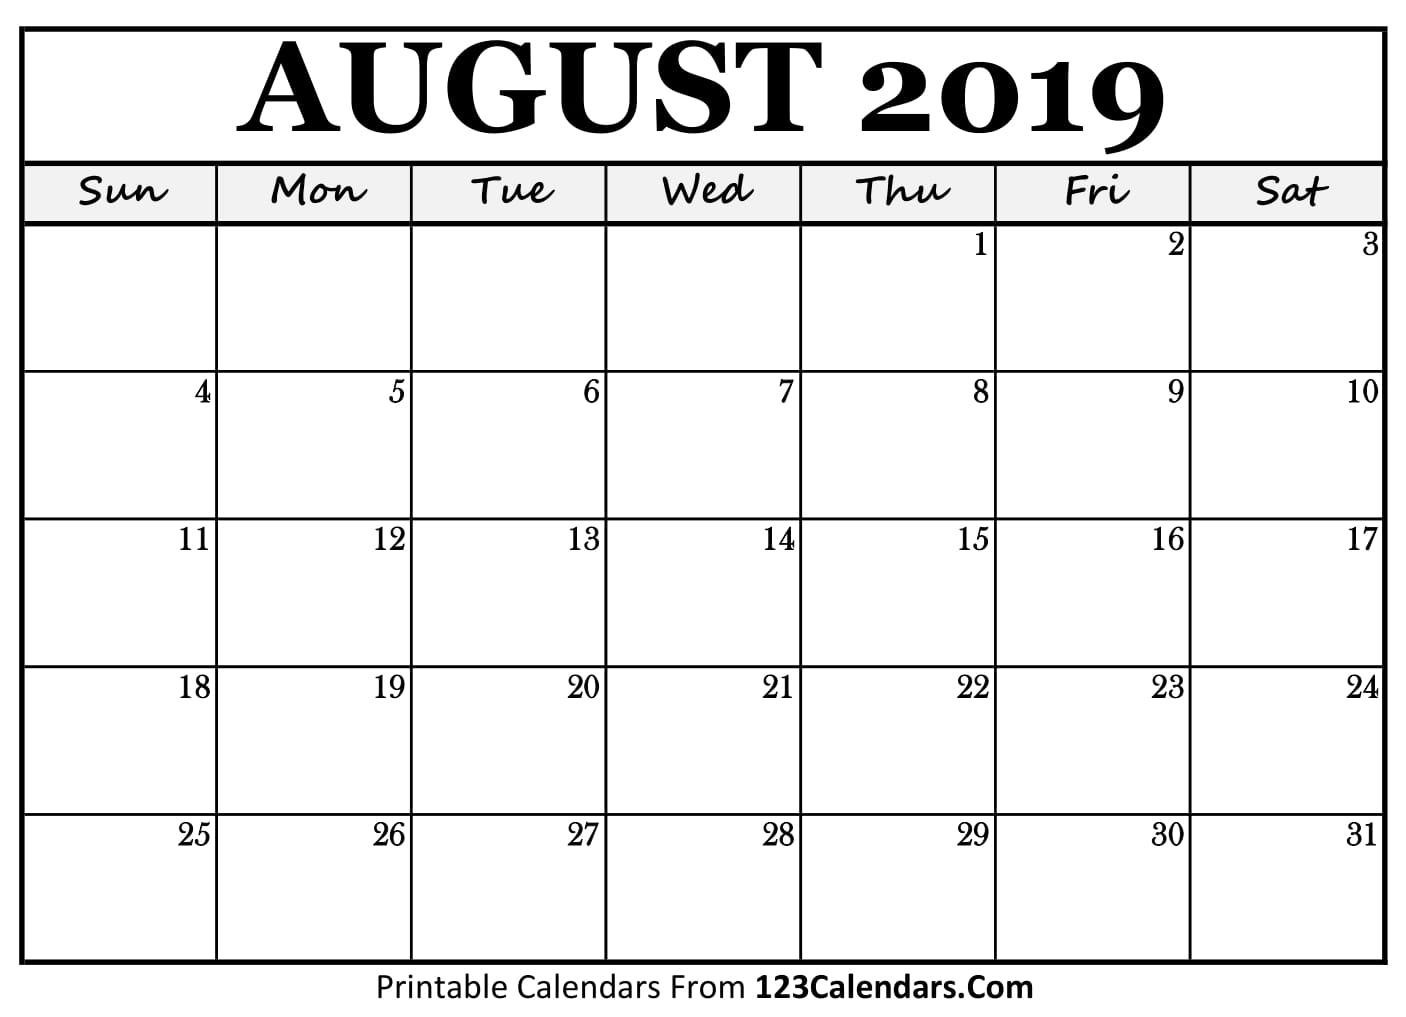 August 2019 Printable Calendar | 123Calendars regarding Blank Calendars For August